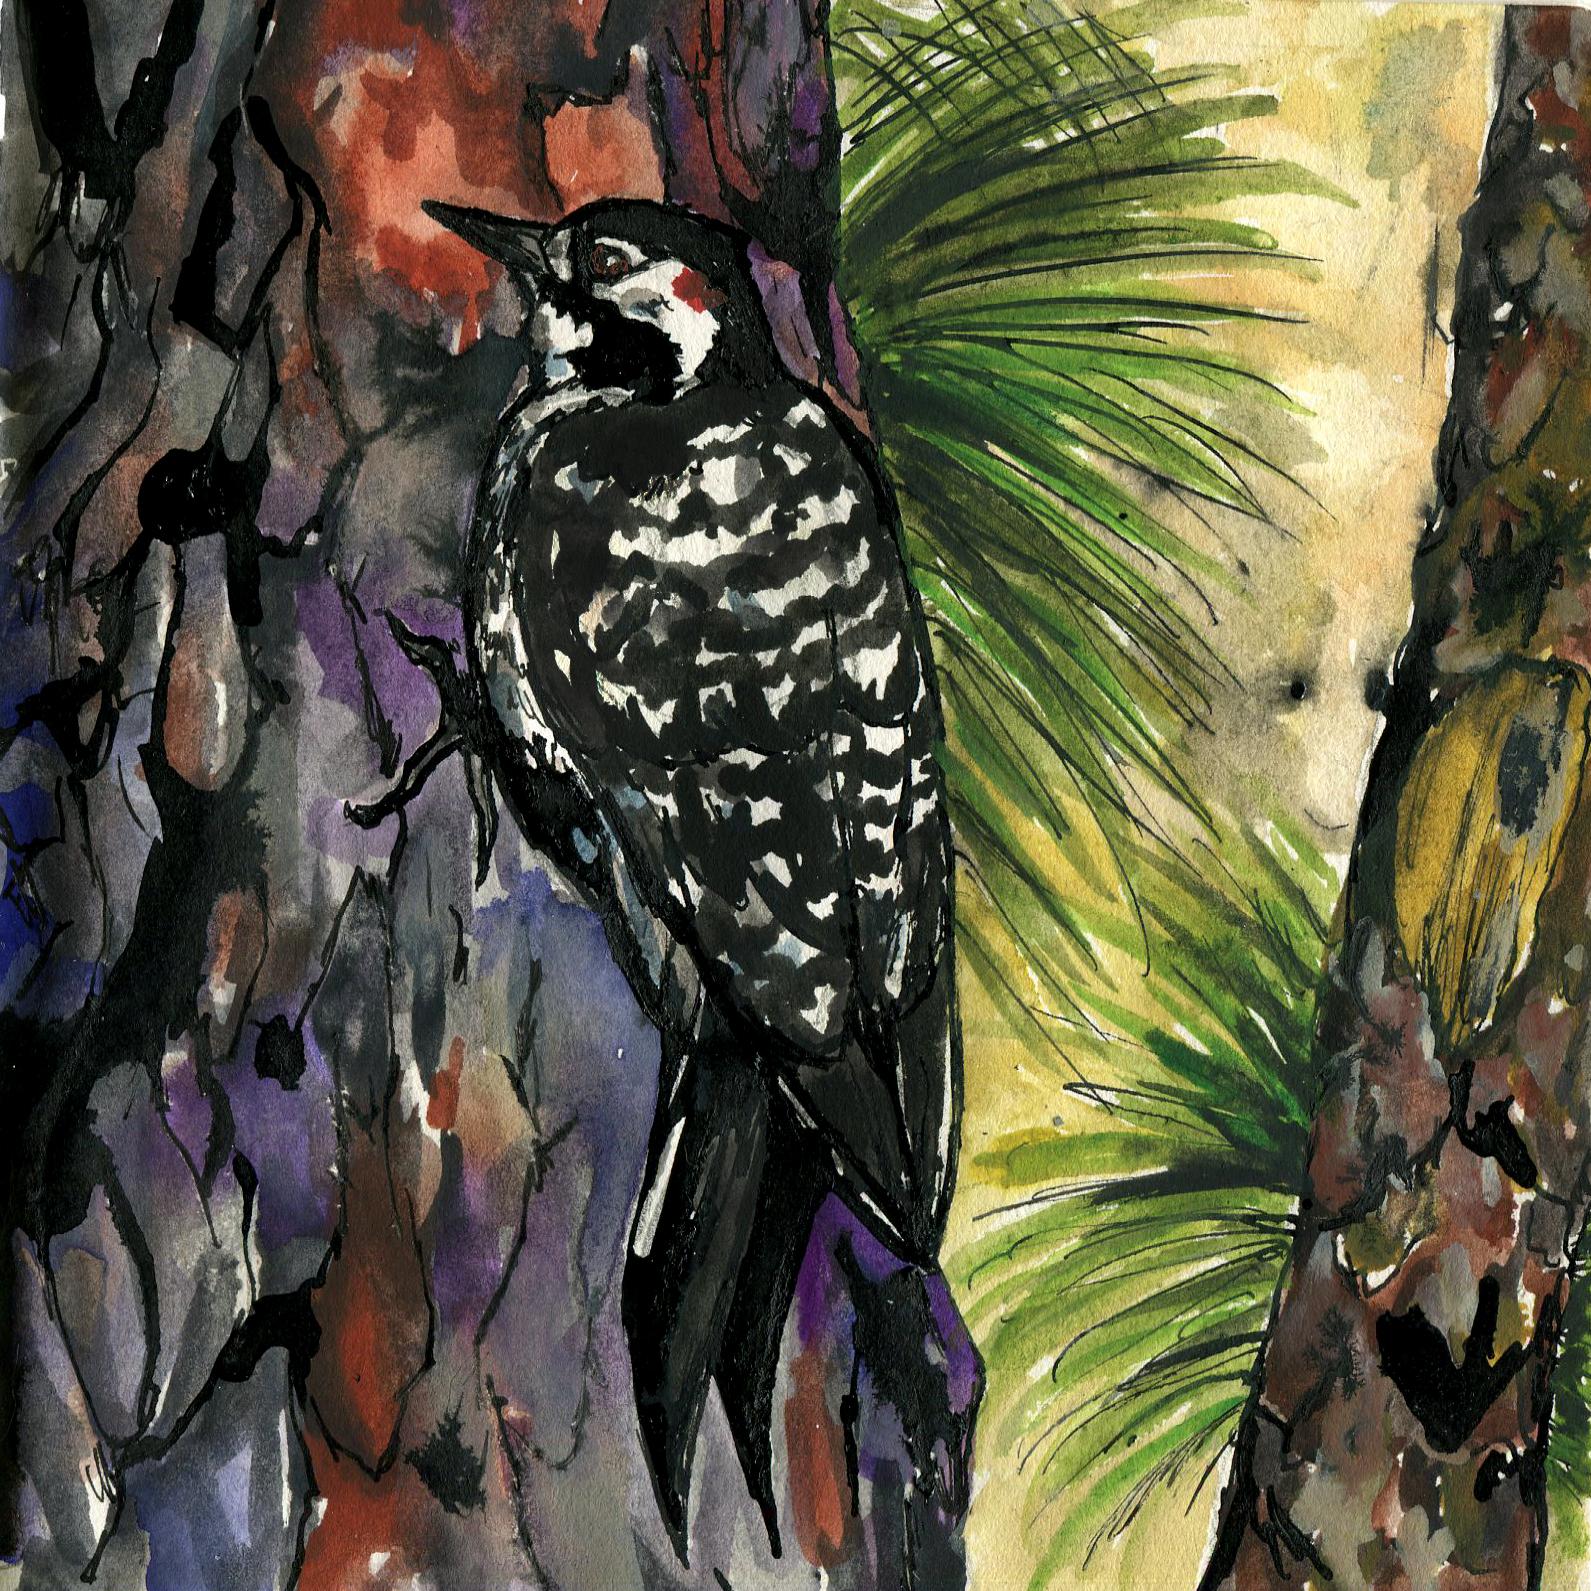 269. Red-cockaded Woodpecker